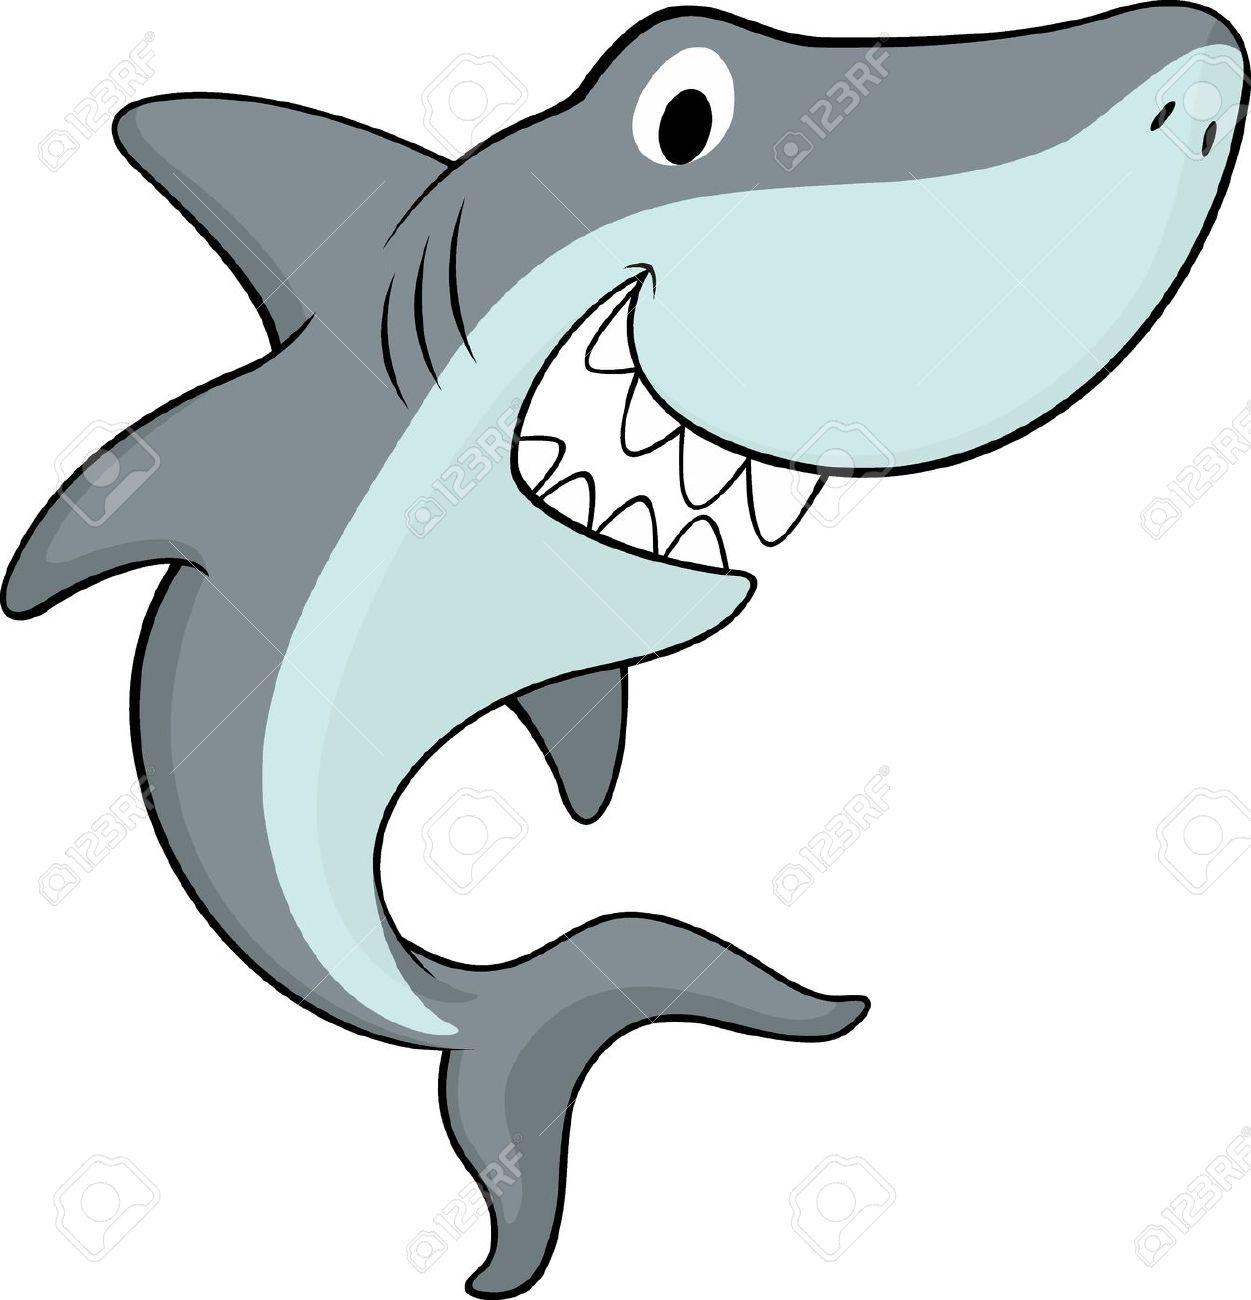 1251x1300 Shark clipart white background